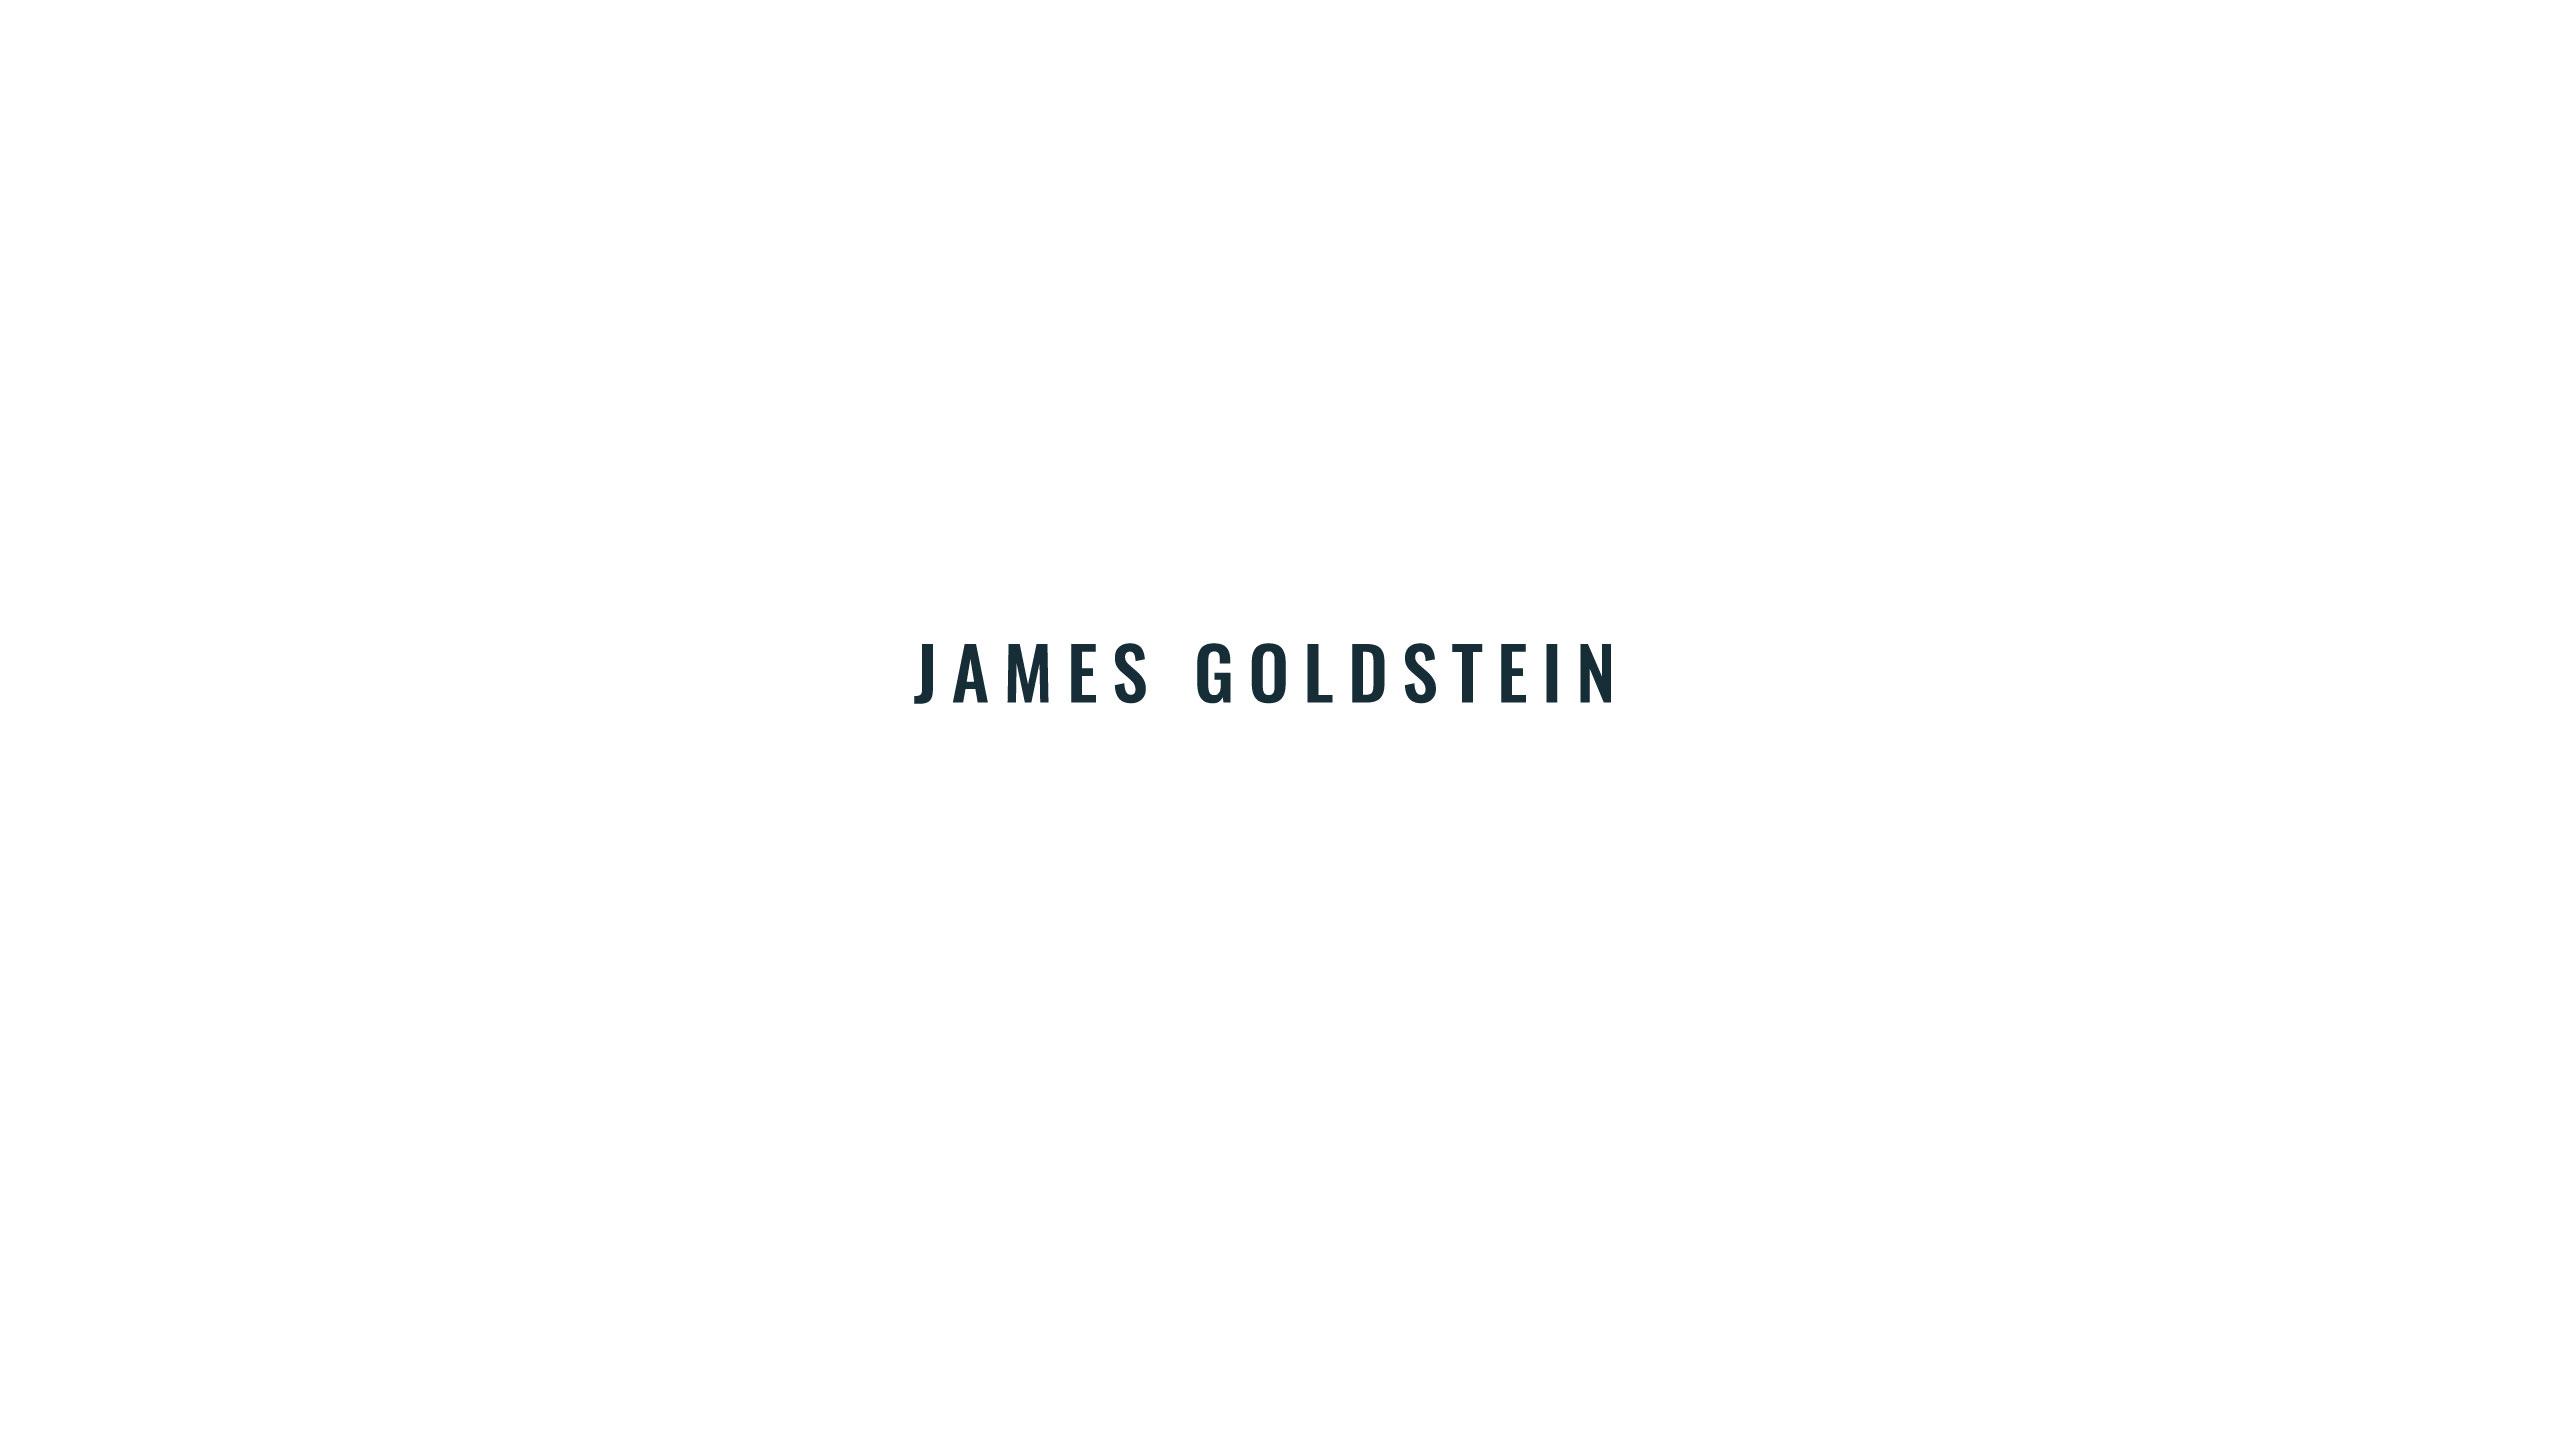 1a_Text_JAMES_GOLDSTEIN-1